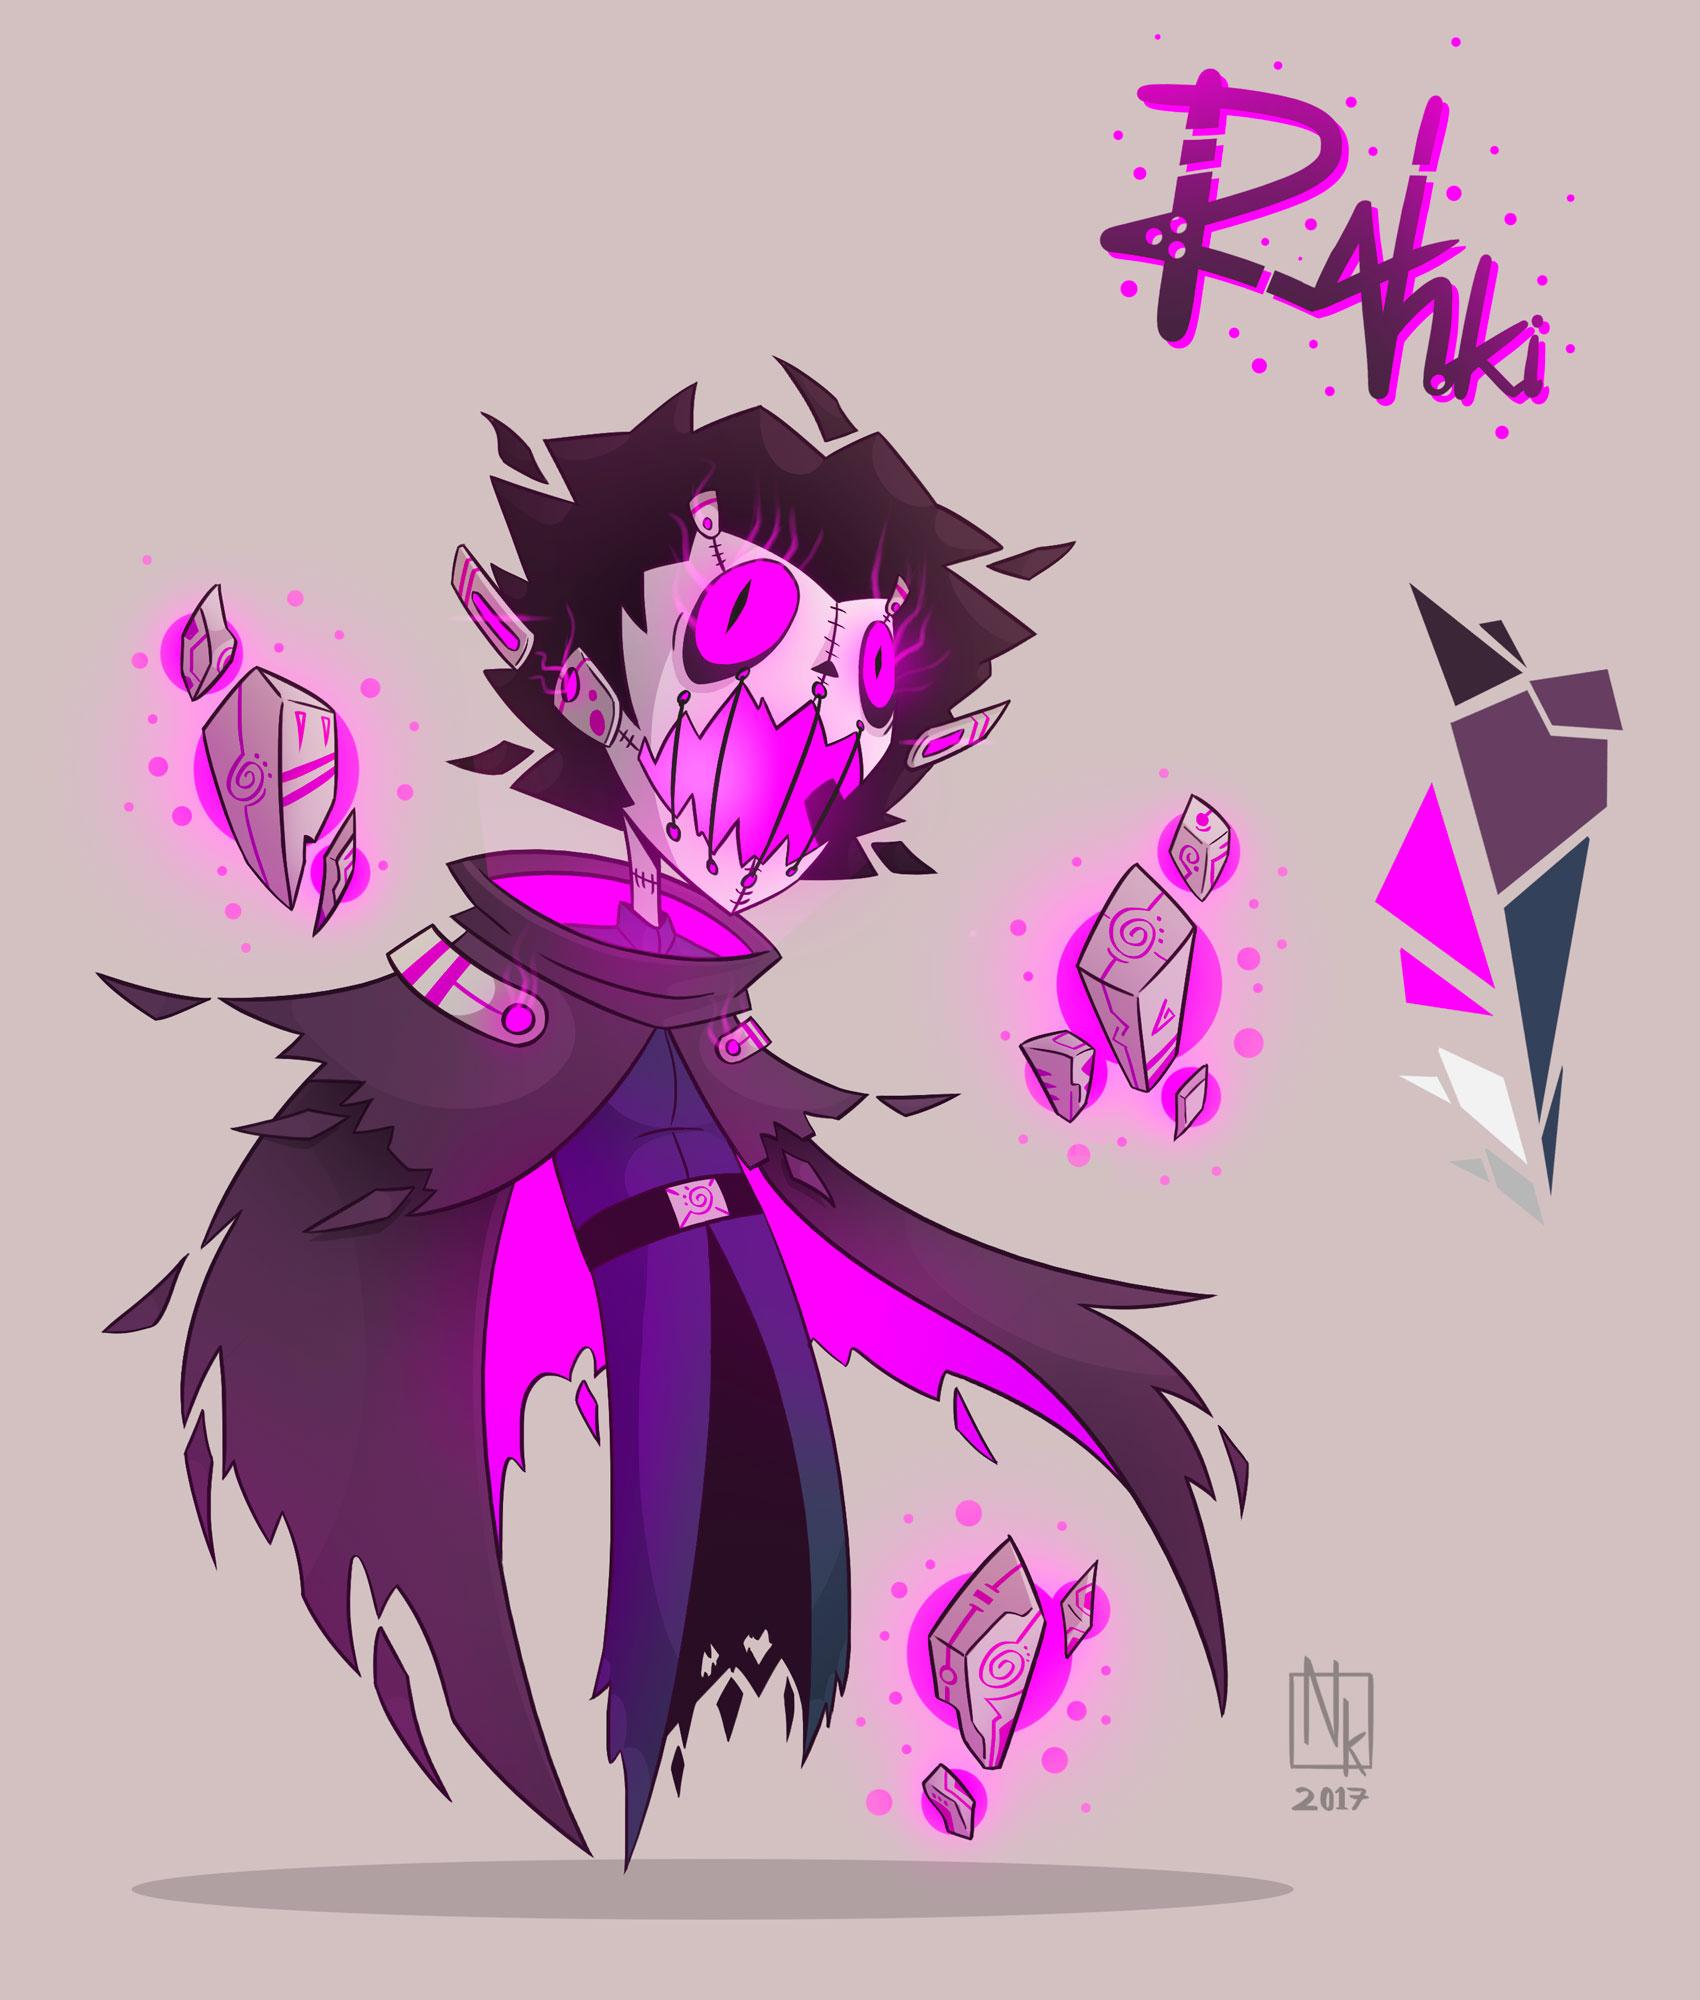 Webcomic character #6: Rahki